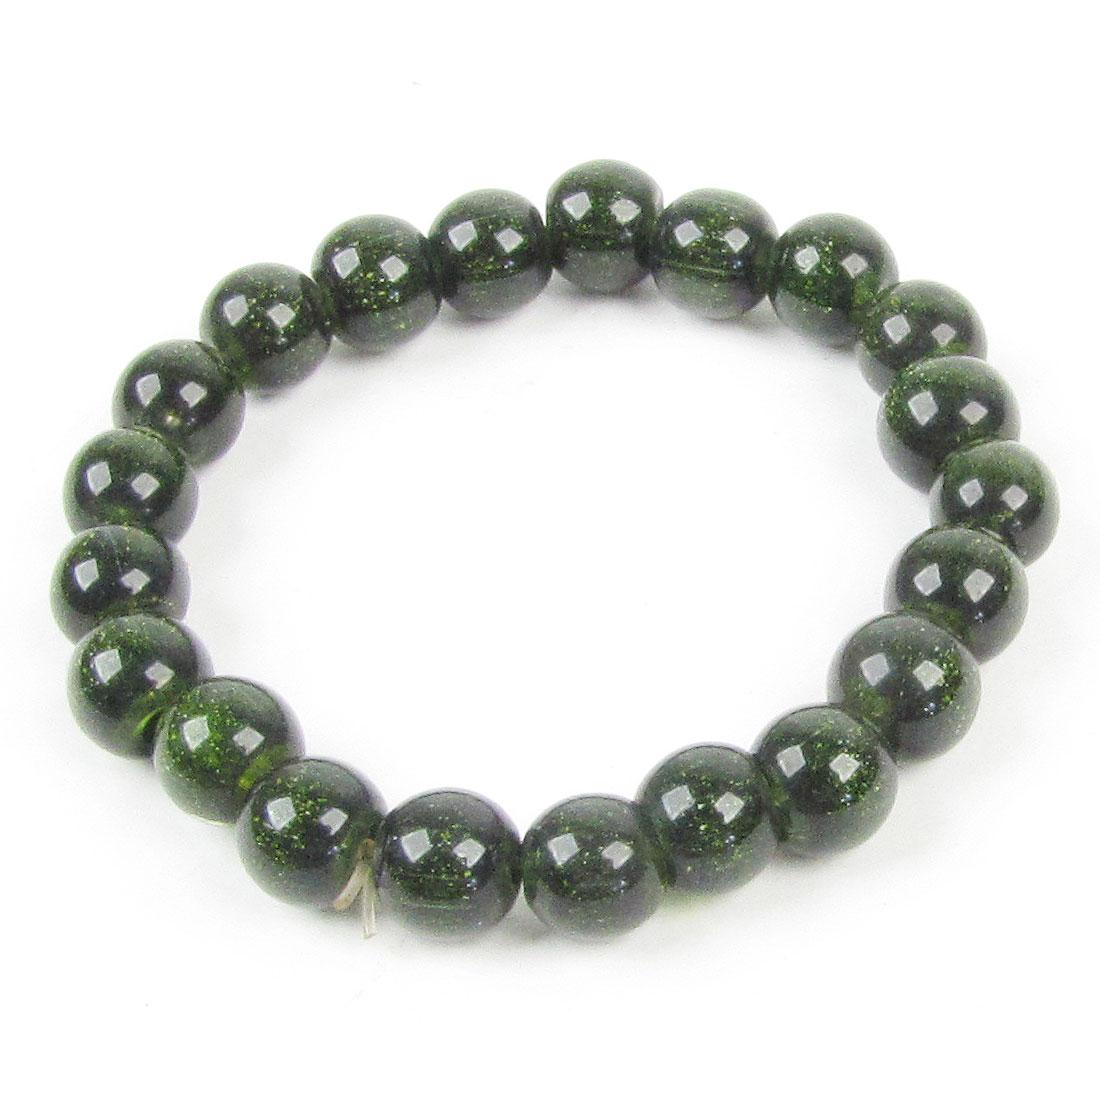 Blackgreen Beaded 21 Round Beads Elastic Bracelet 10 Pcs